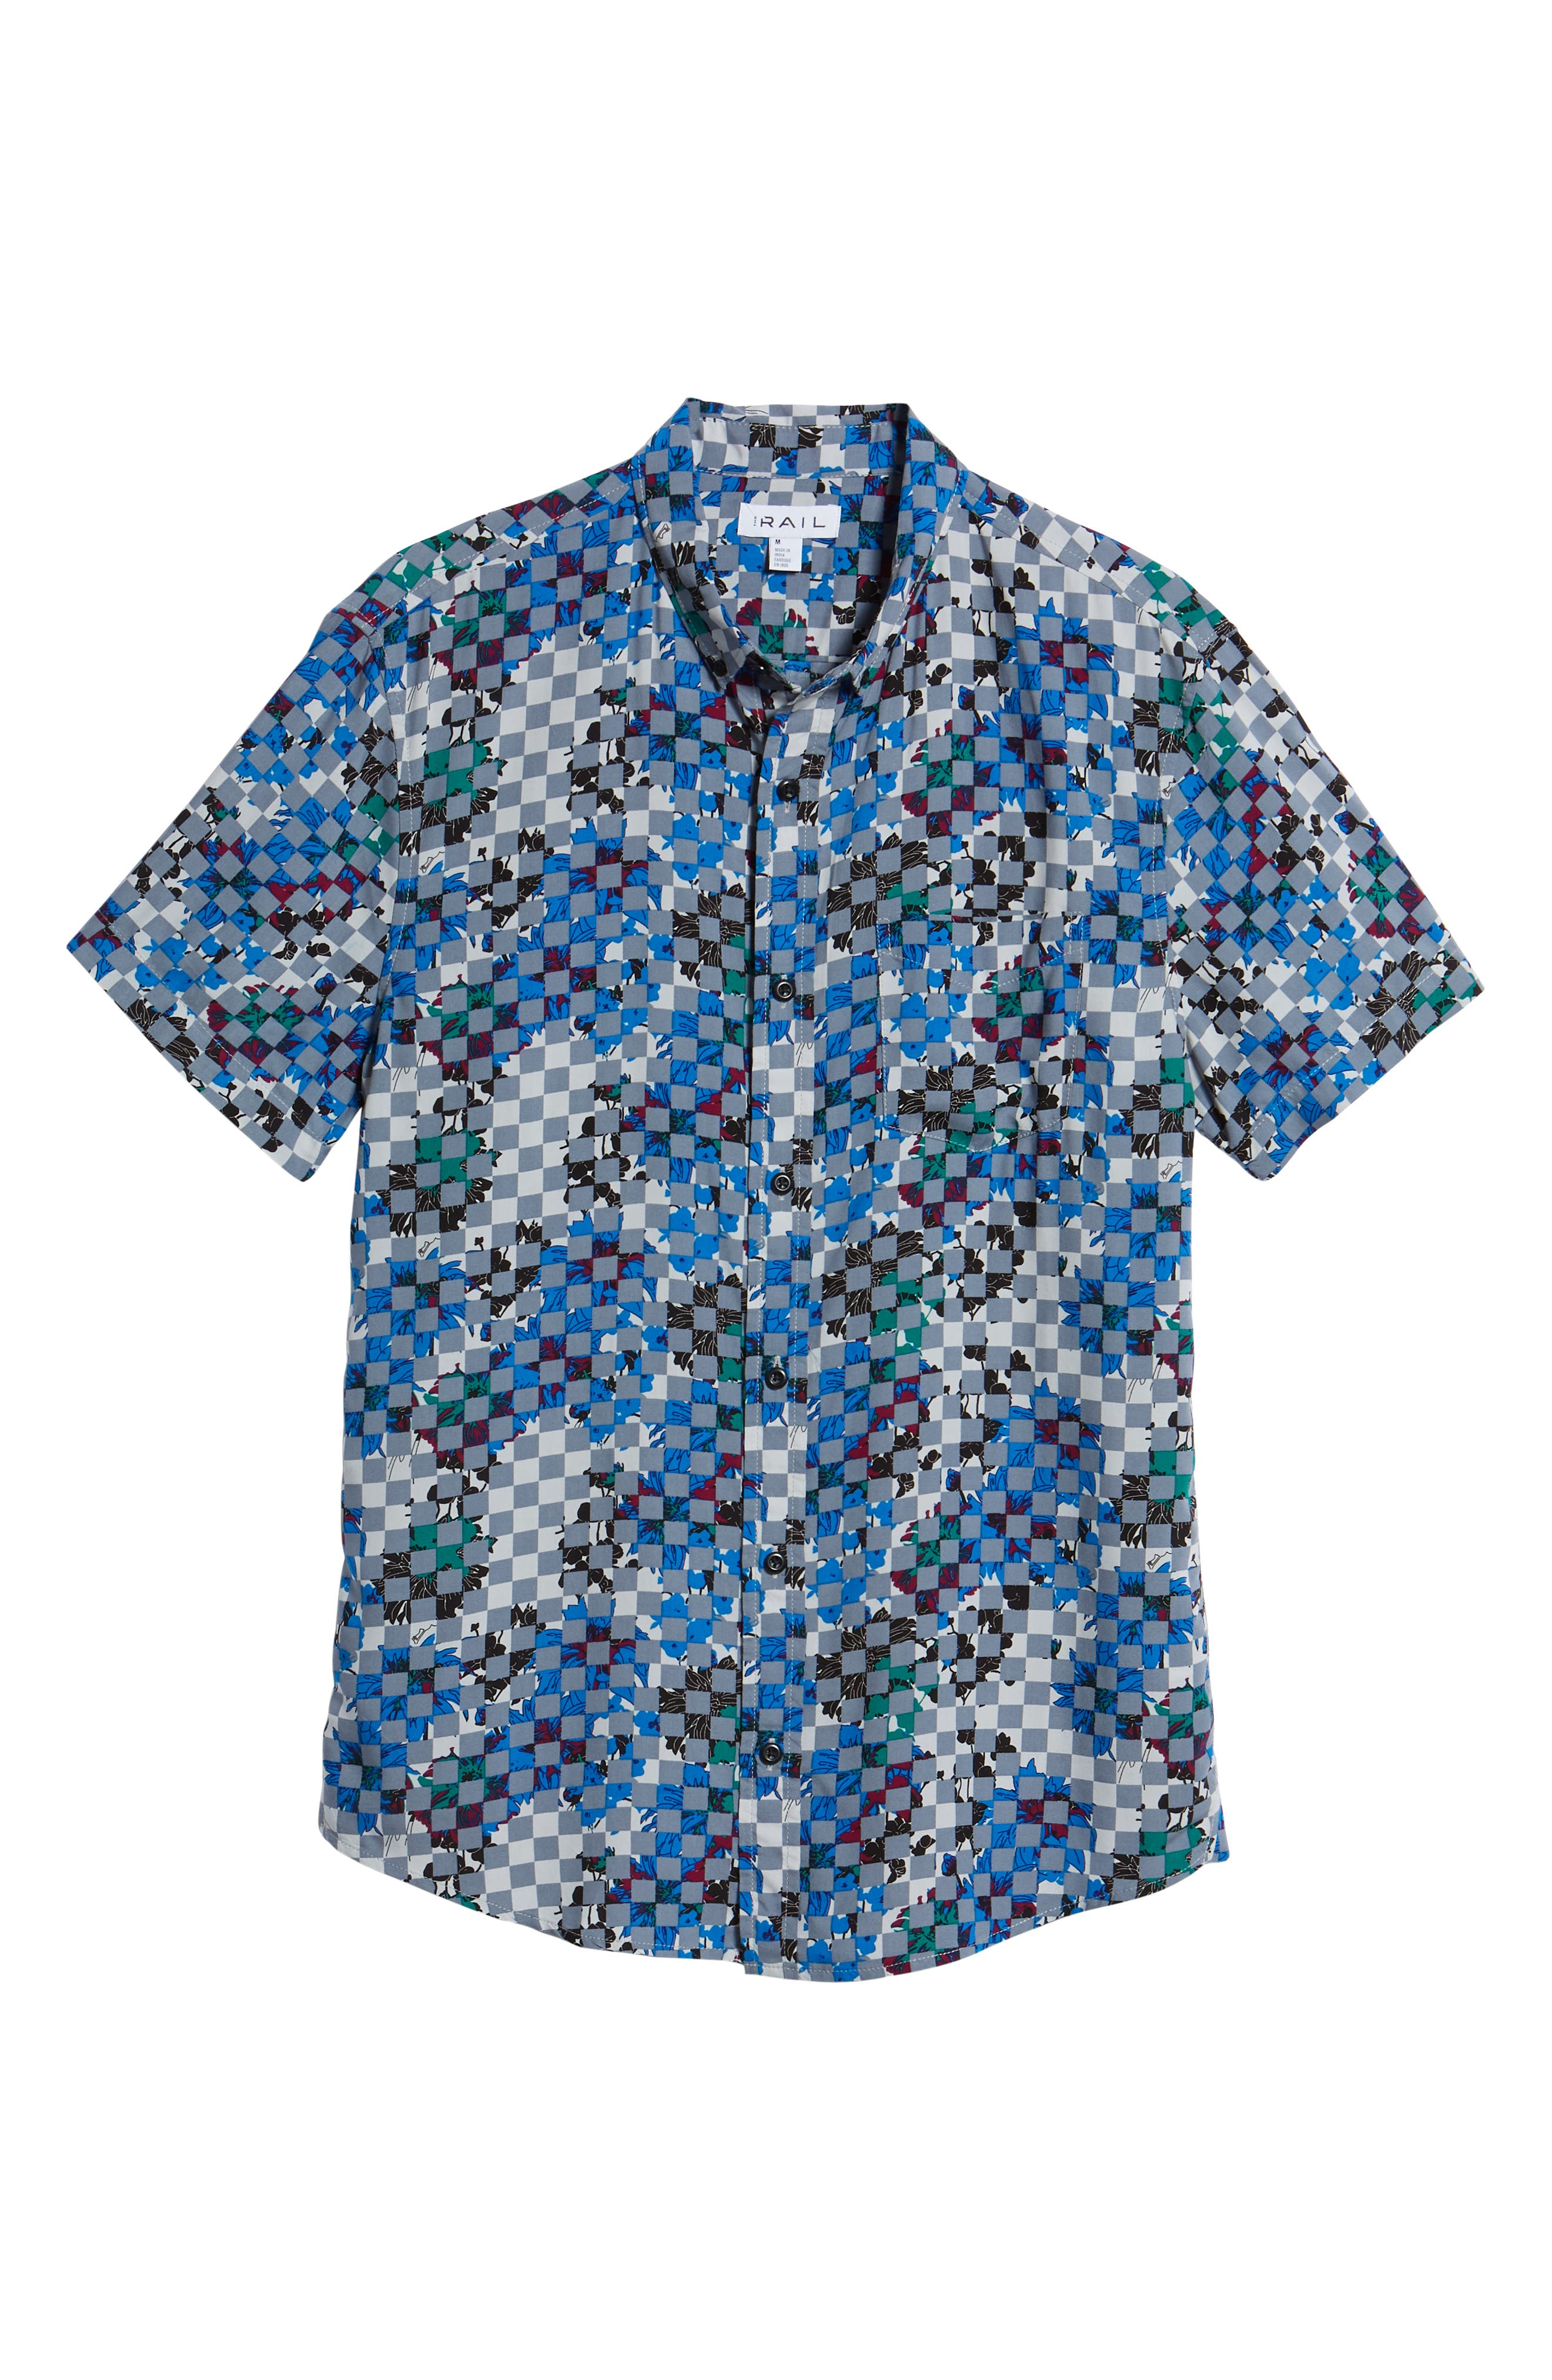 Woven Print Shirt,                             Alternate thumbnail 5, color,                             Grey Checker Board Floral